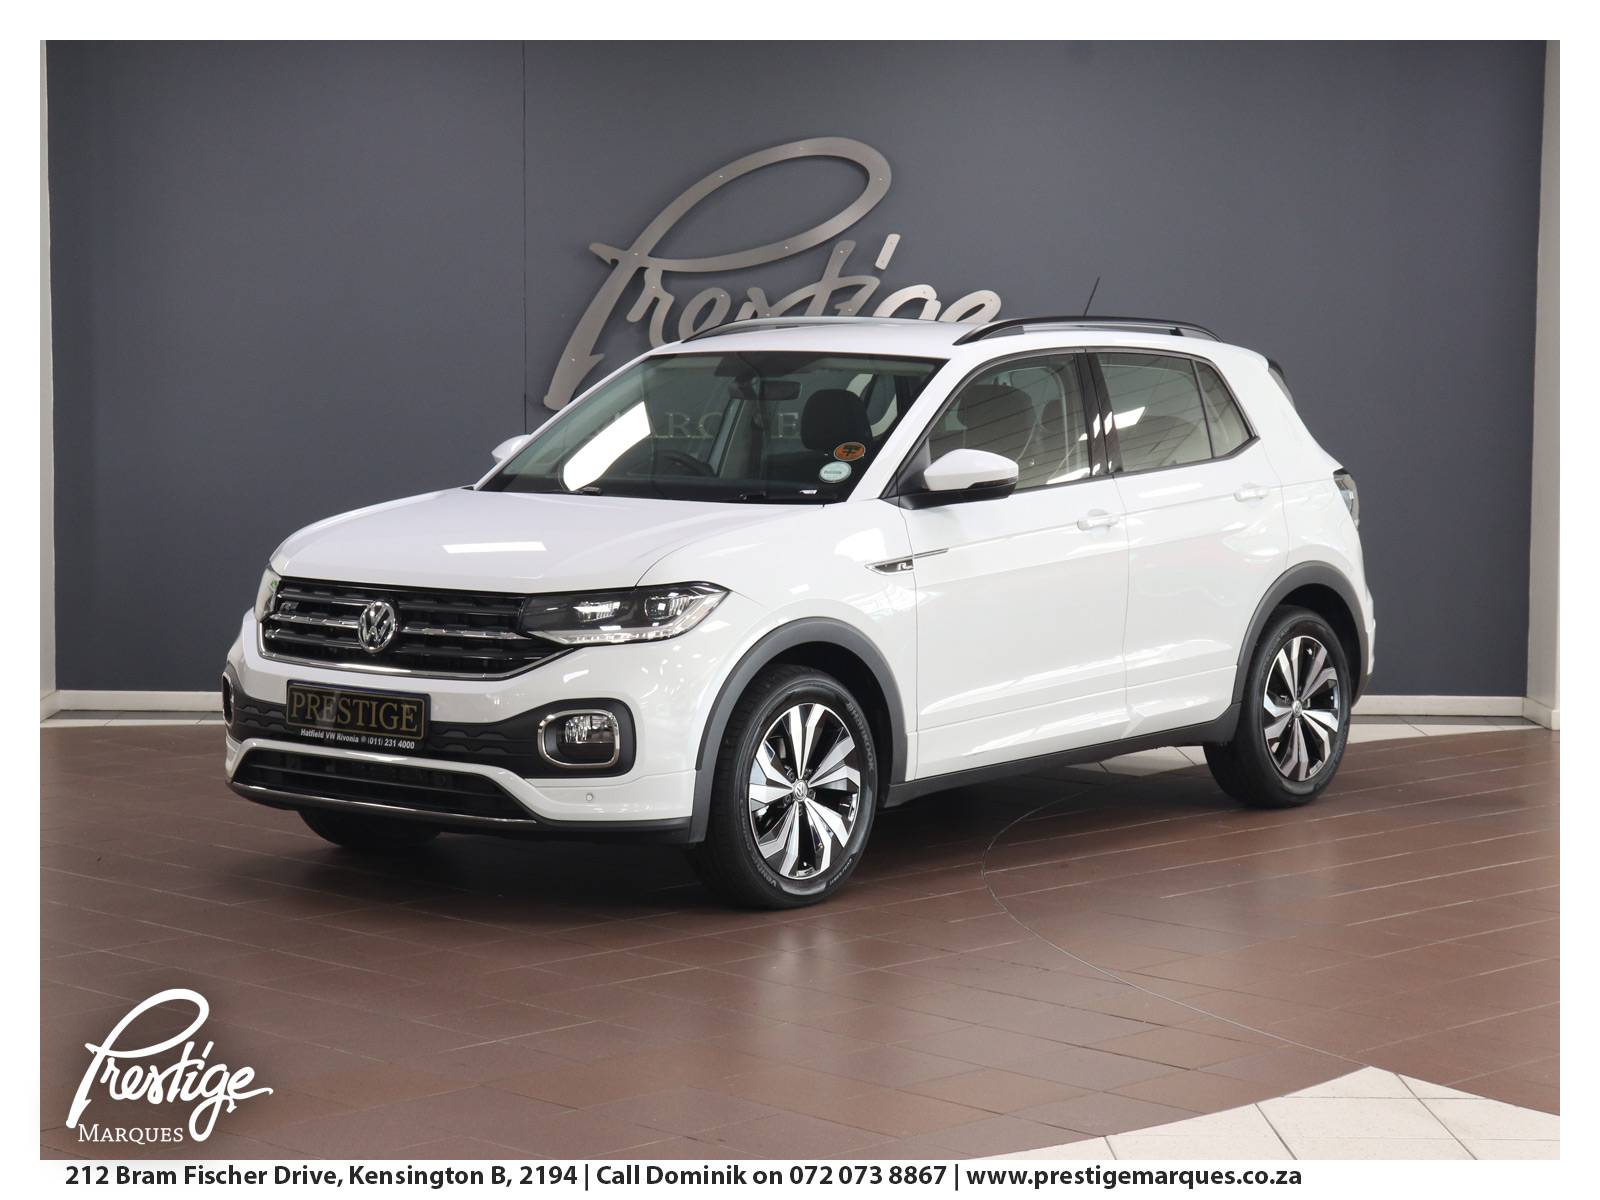 2019-Volkswagen-T-Cross-Prestige-Marques-Randburg-Sandton-7